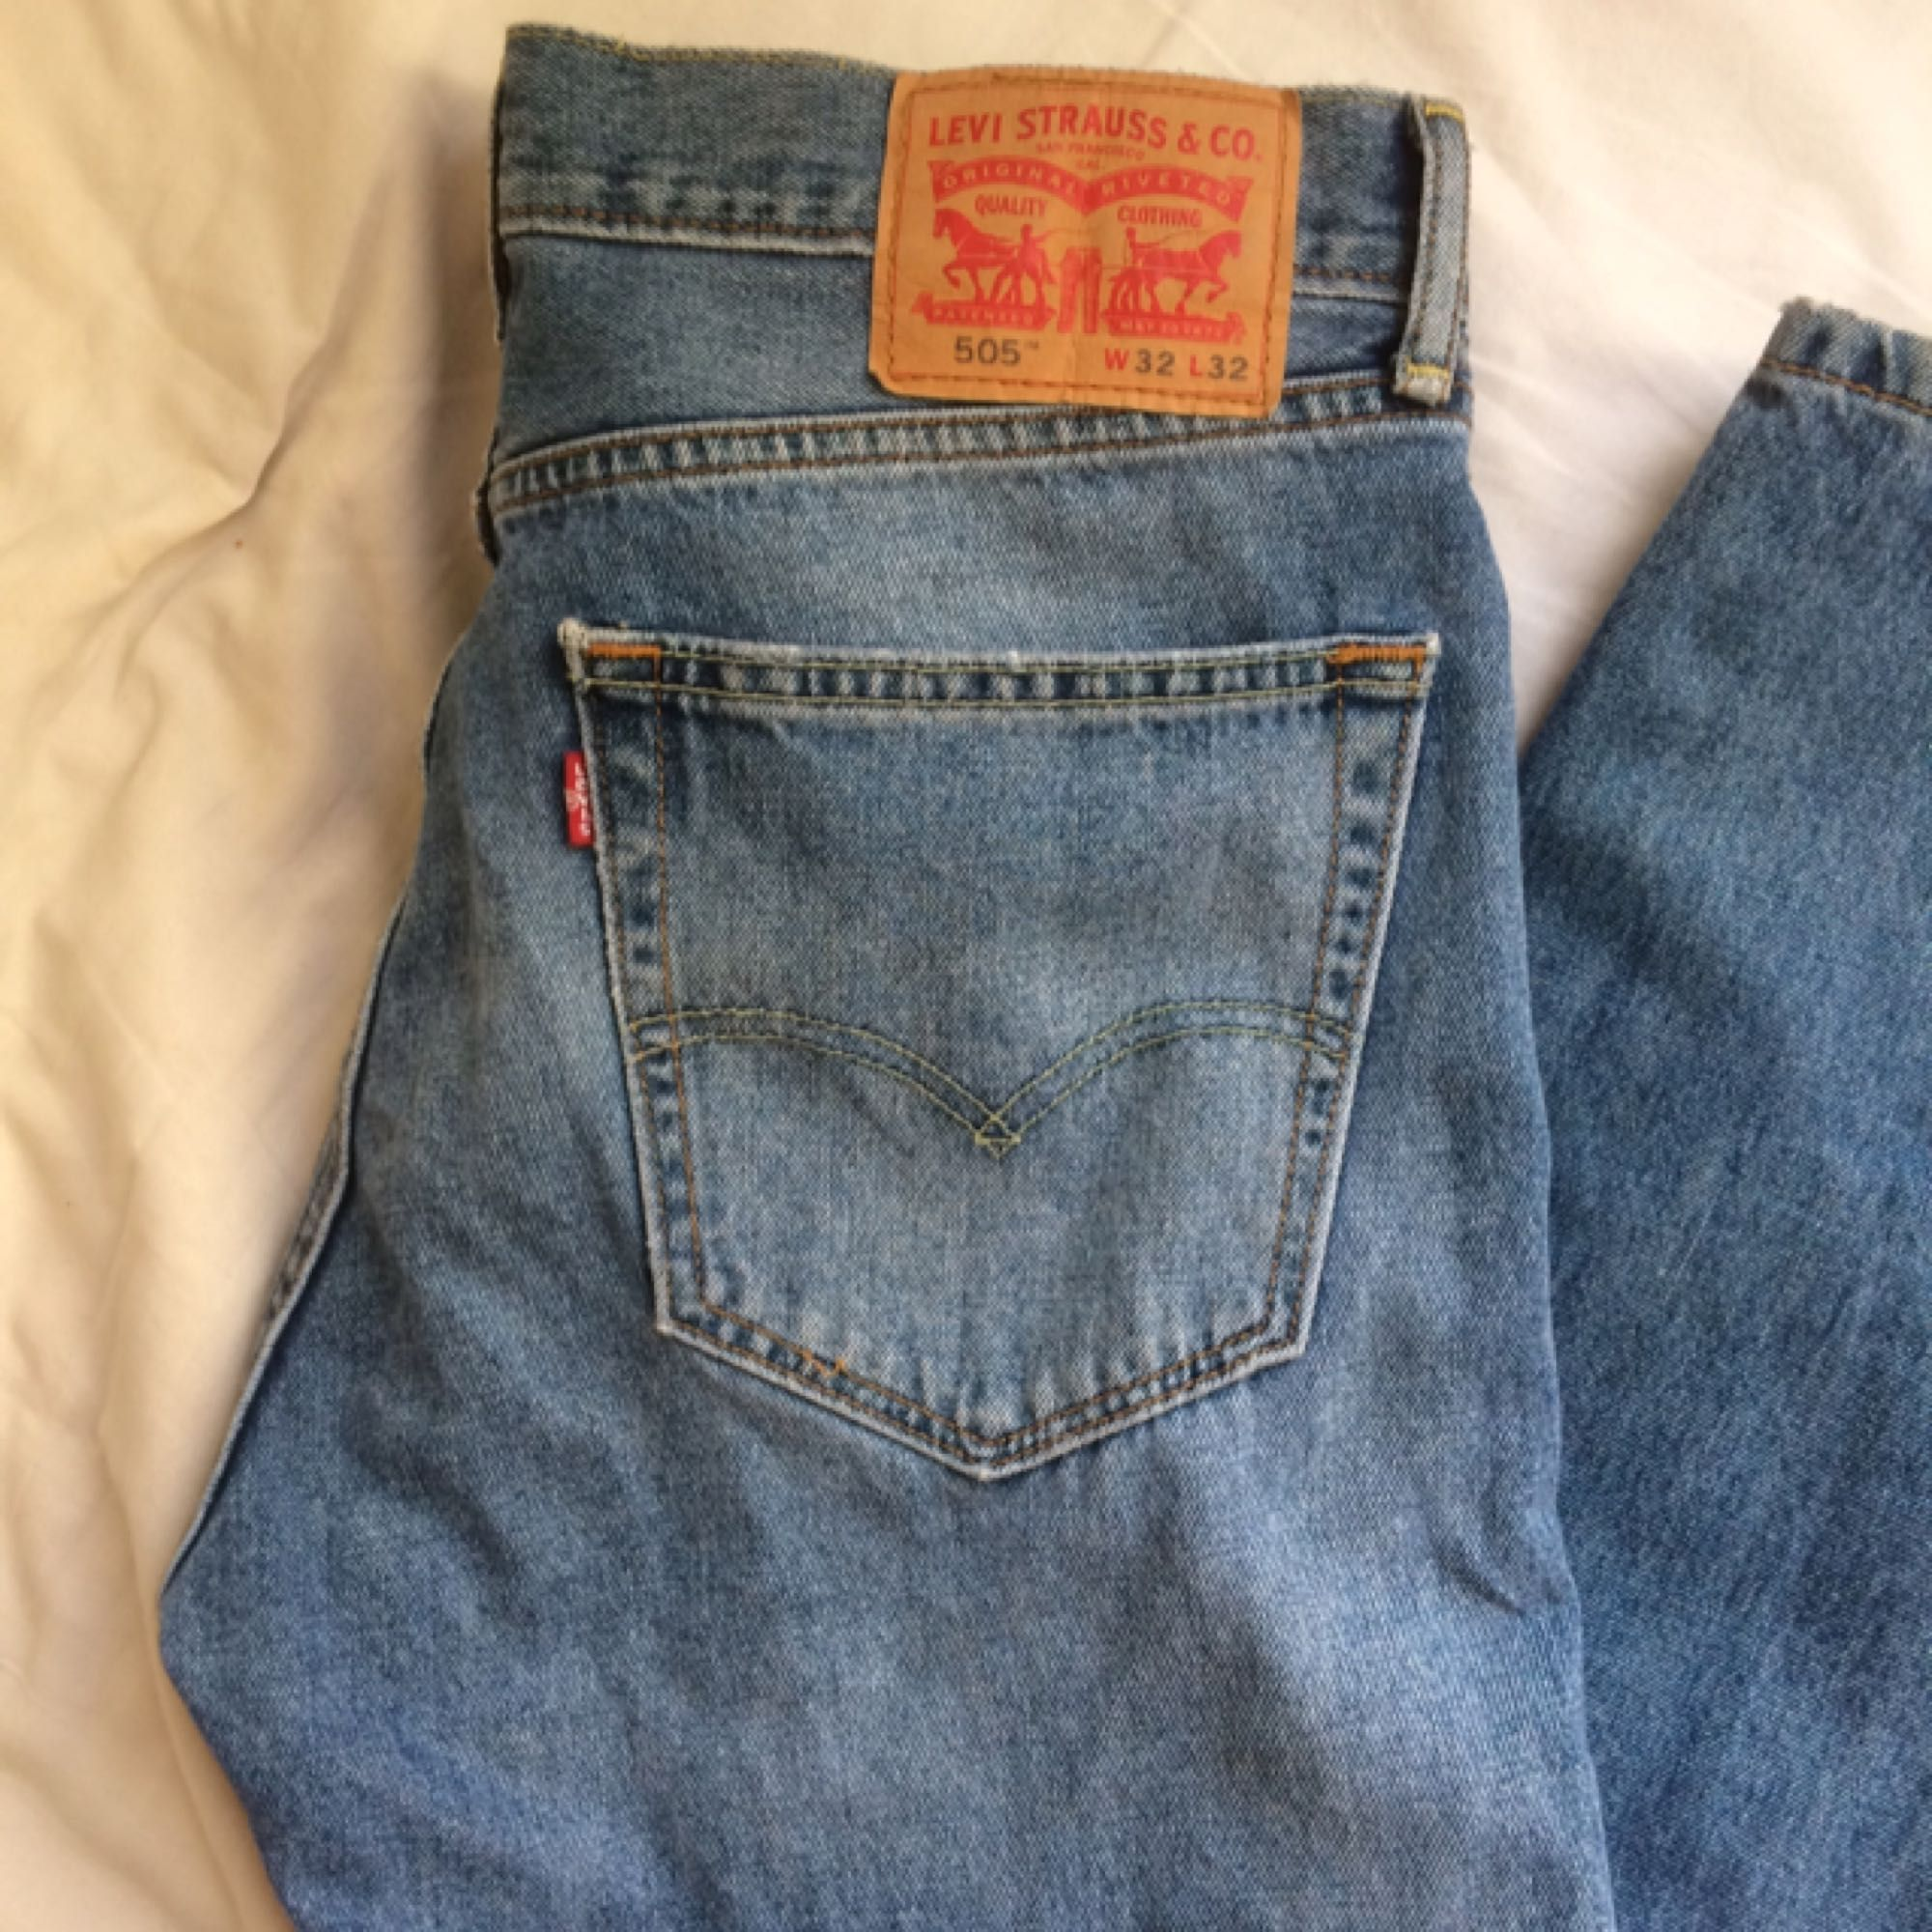 Ganska så högmidjade Levi s-jeans! Bra skick bara lite snyggt slitna (inga  hål ... 58e65f4f32e3f